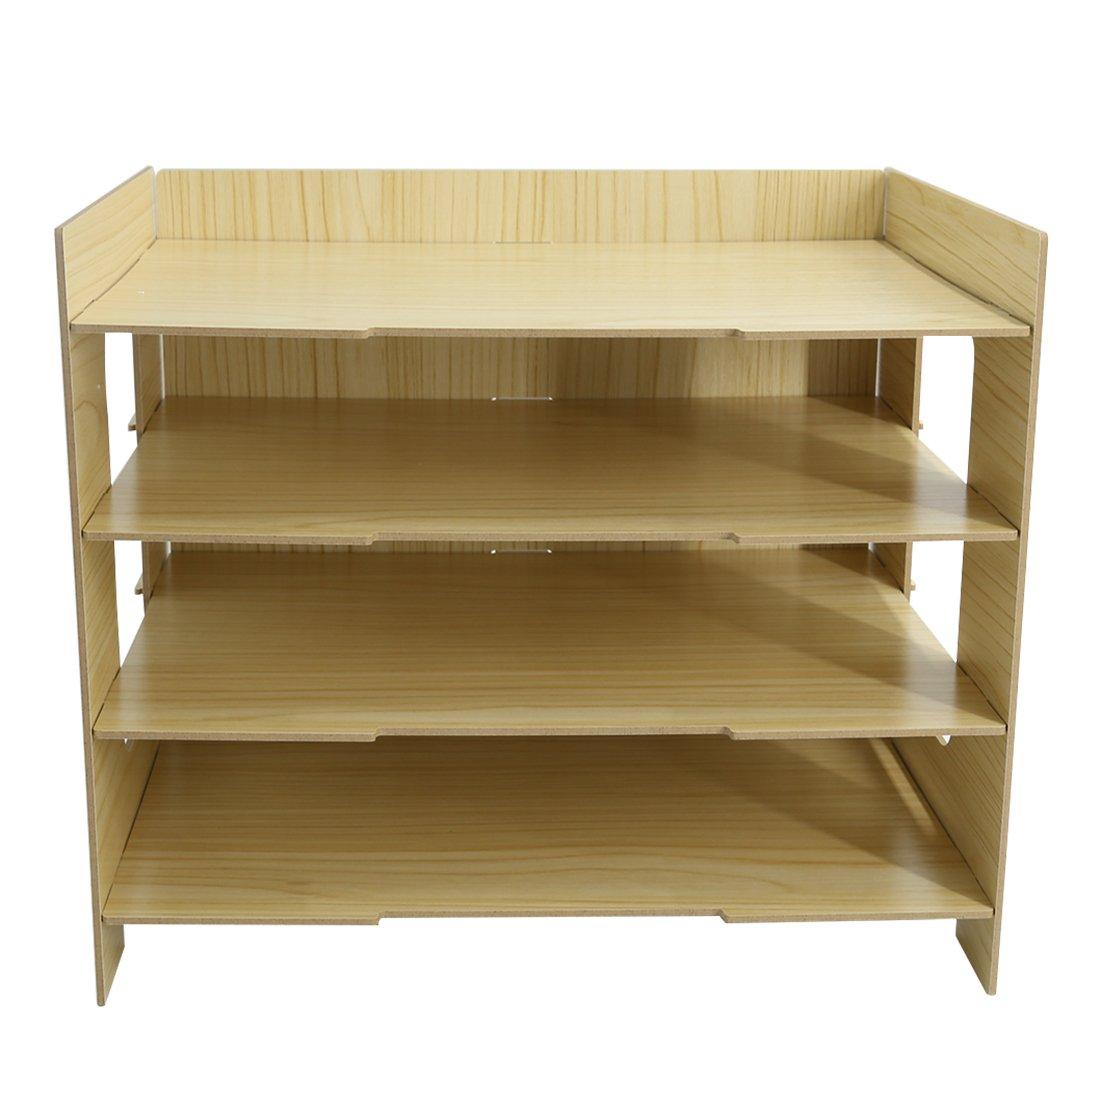 PeleusTech® 4 Layers Wood Storage Rack Durable Office Organization for File Desktop Organizer Shelf for Books Documents - (Wood Grain) by PeleusTech® (Image #1)